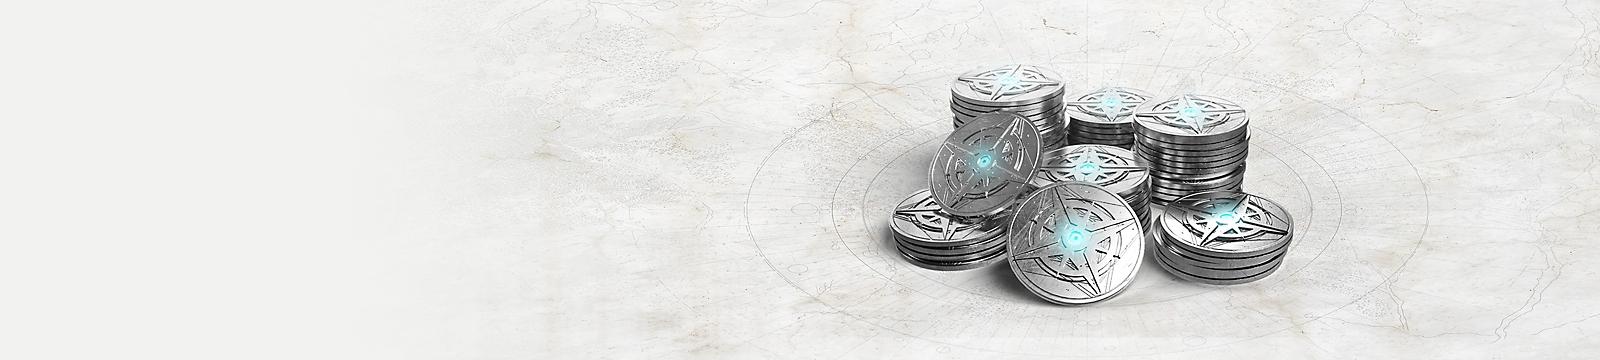 Destiny 2 - Fondo de sección comprar plata